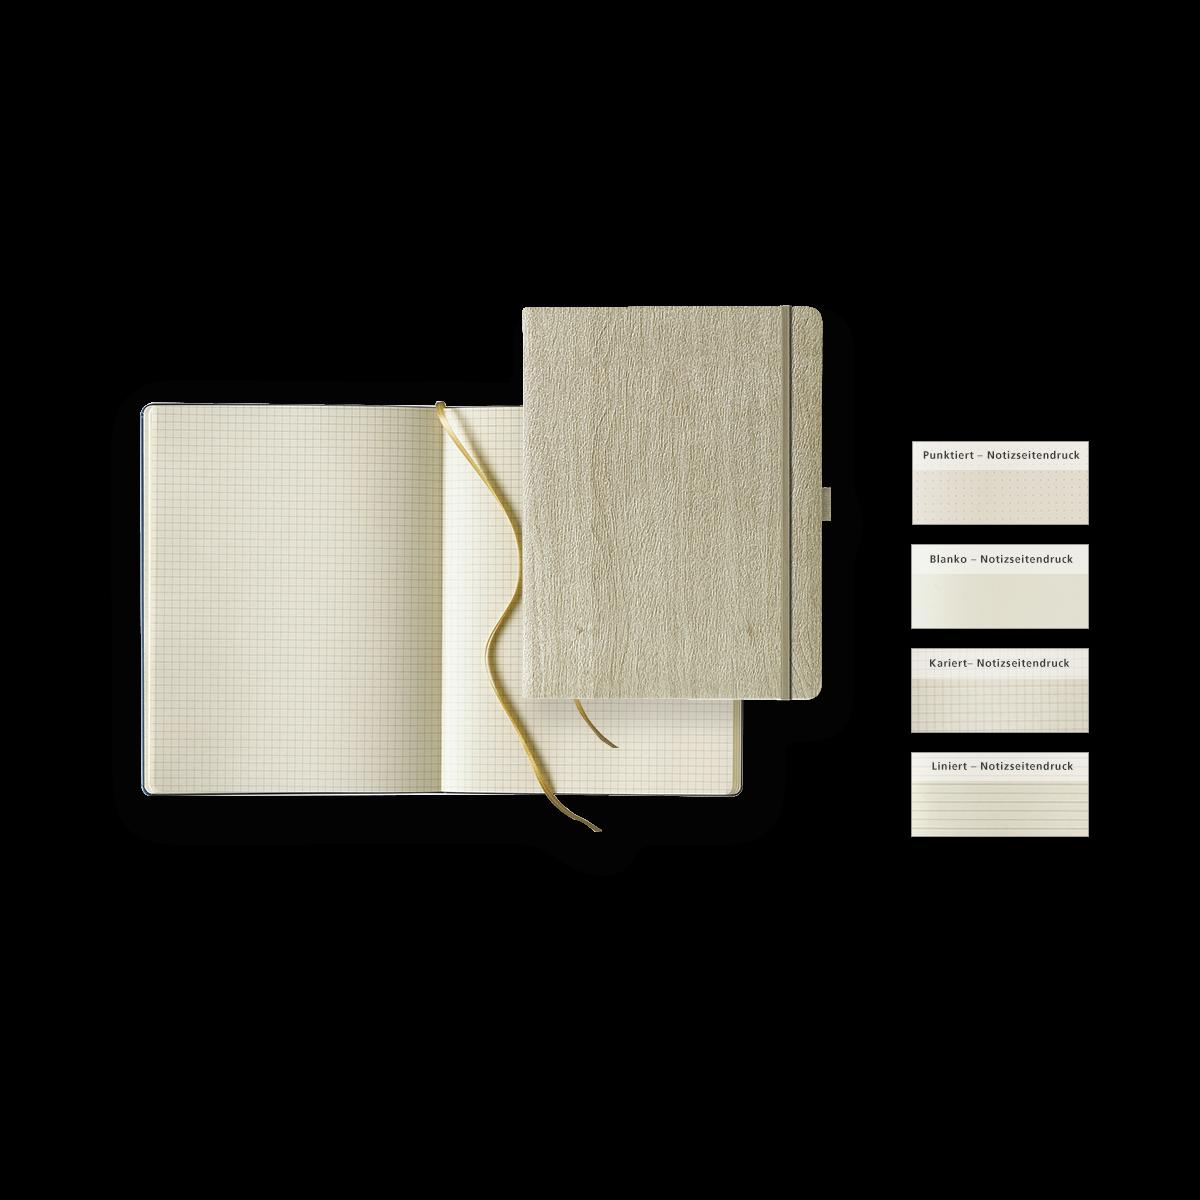 Notizbuch Modell Ivory Notebook Extra Large